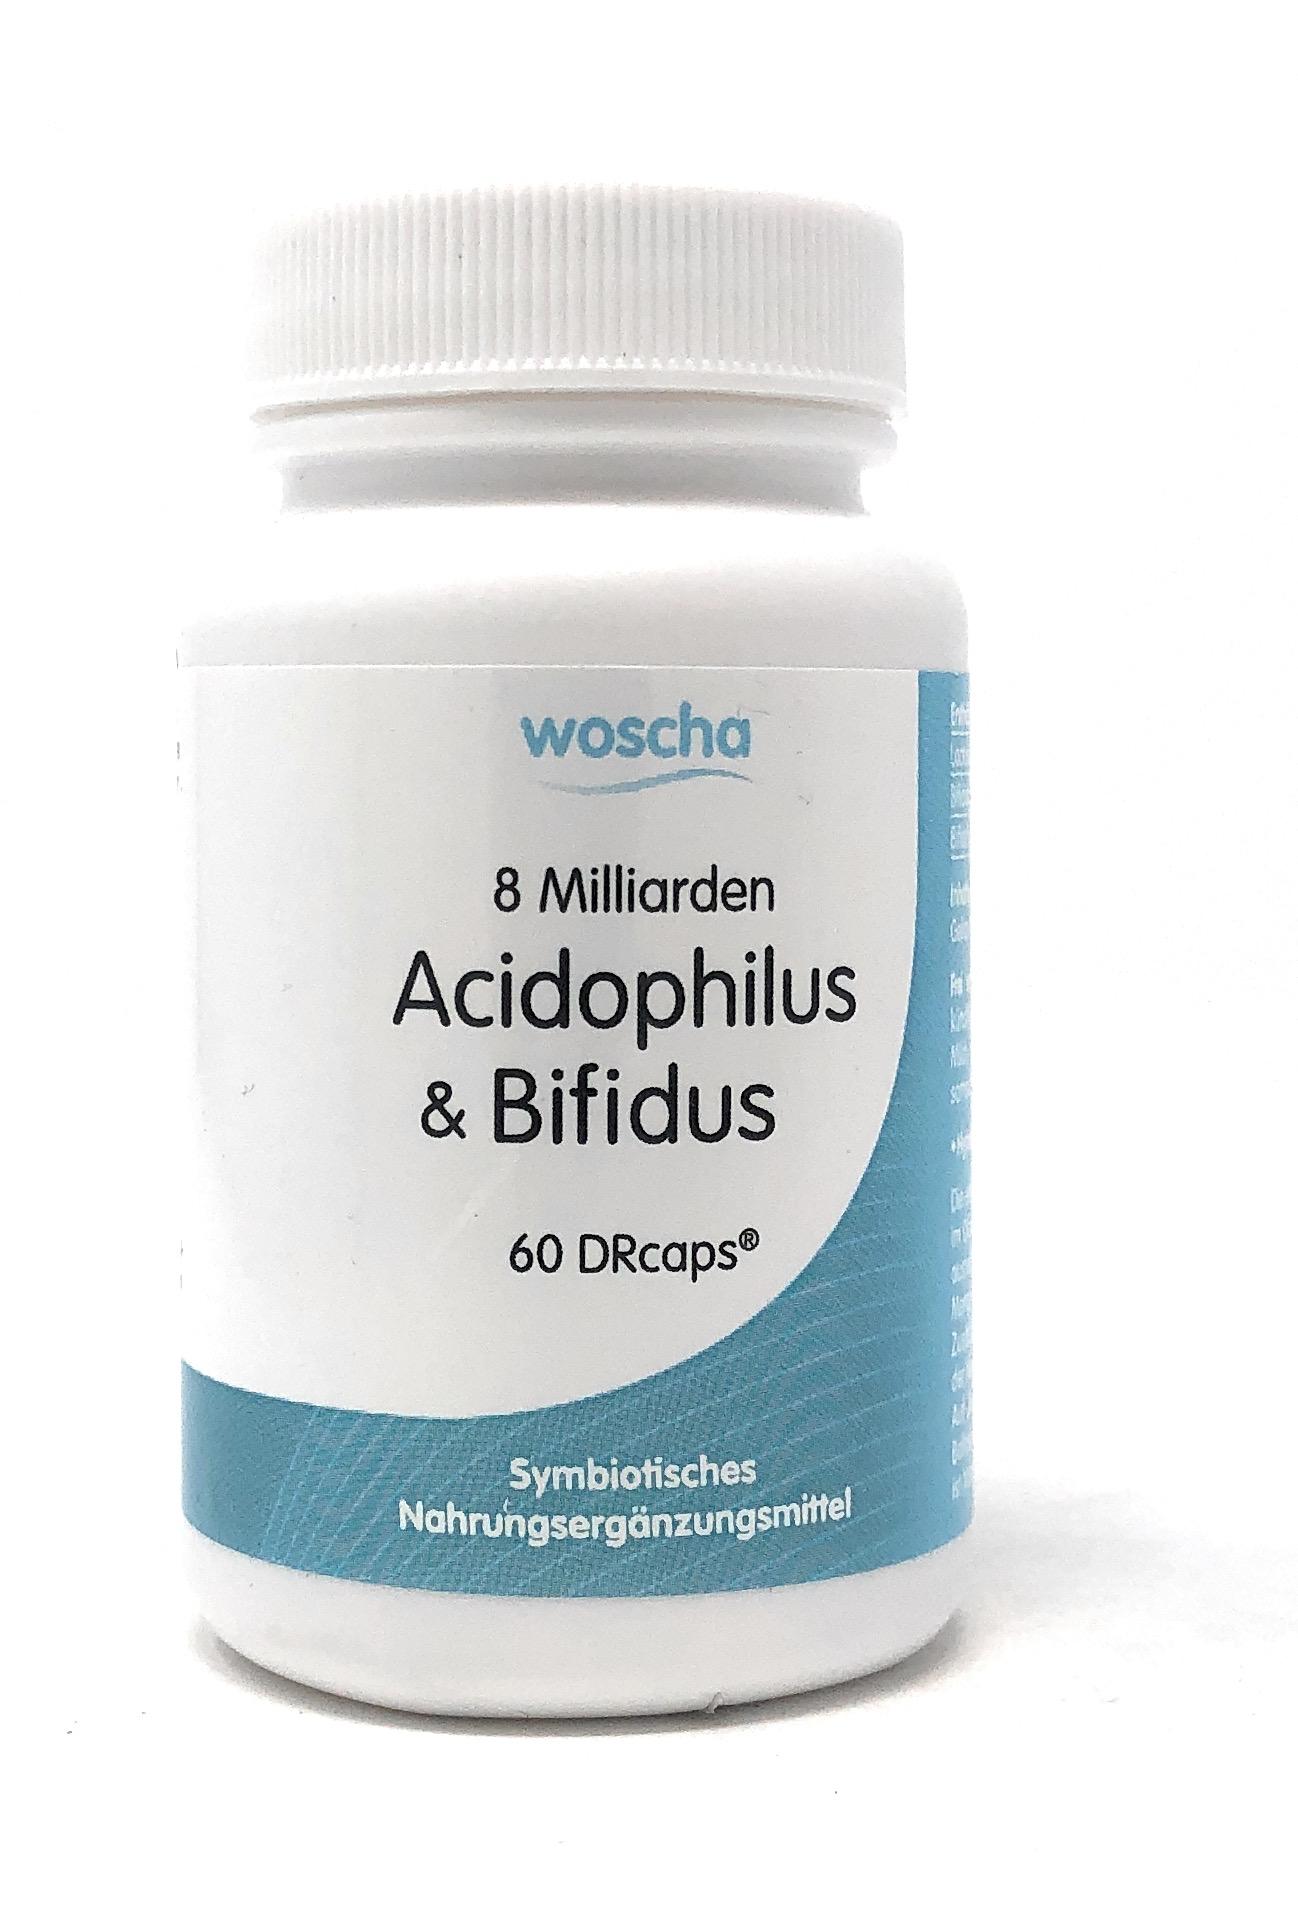 woscha 8 Milliarden Acidophilus und Bifidus 60DRcaps (25g)(vegan)